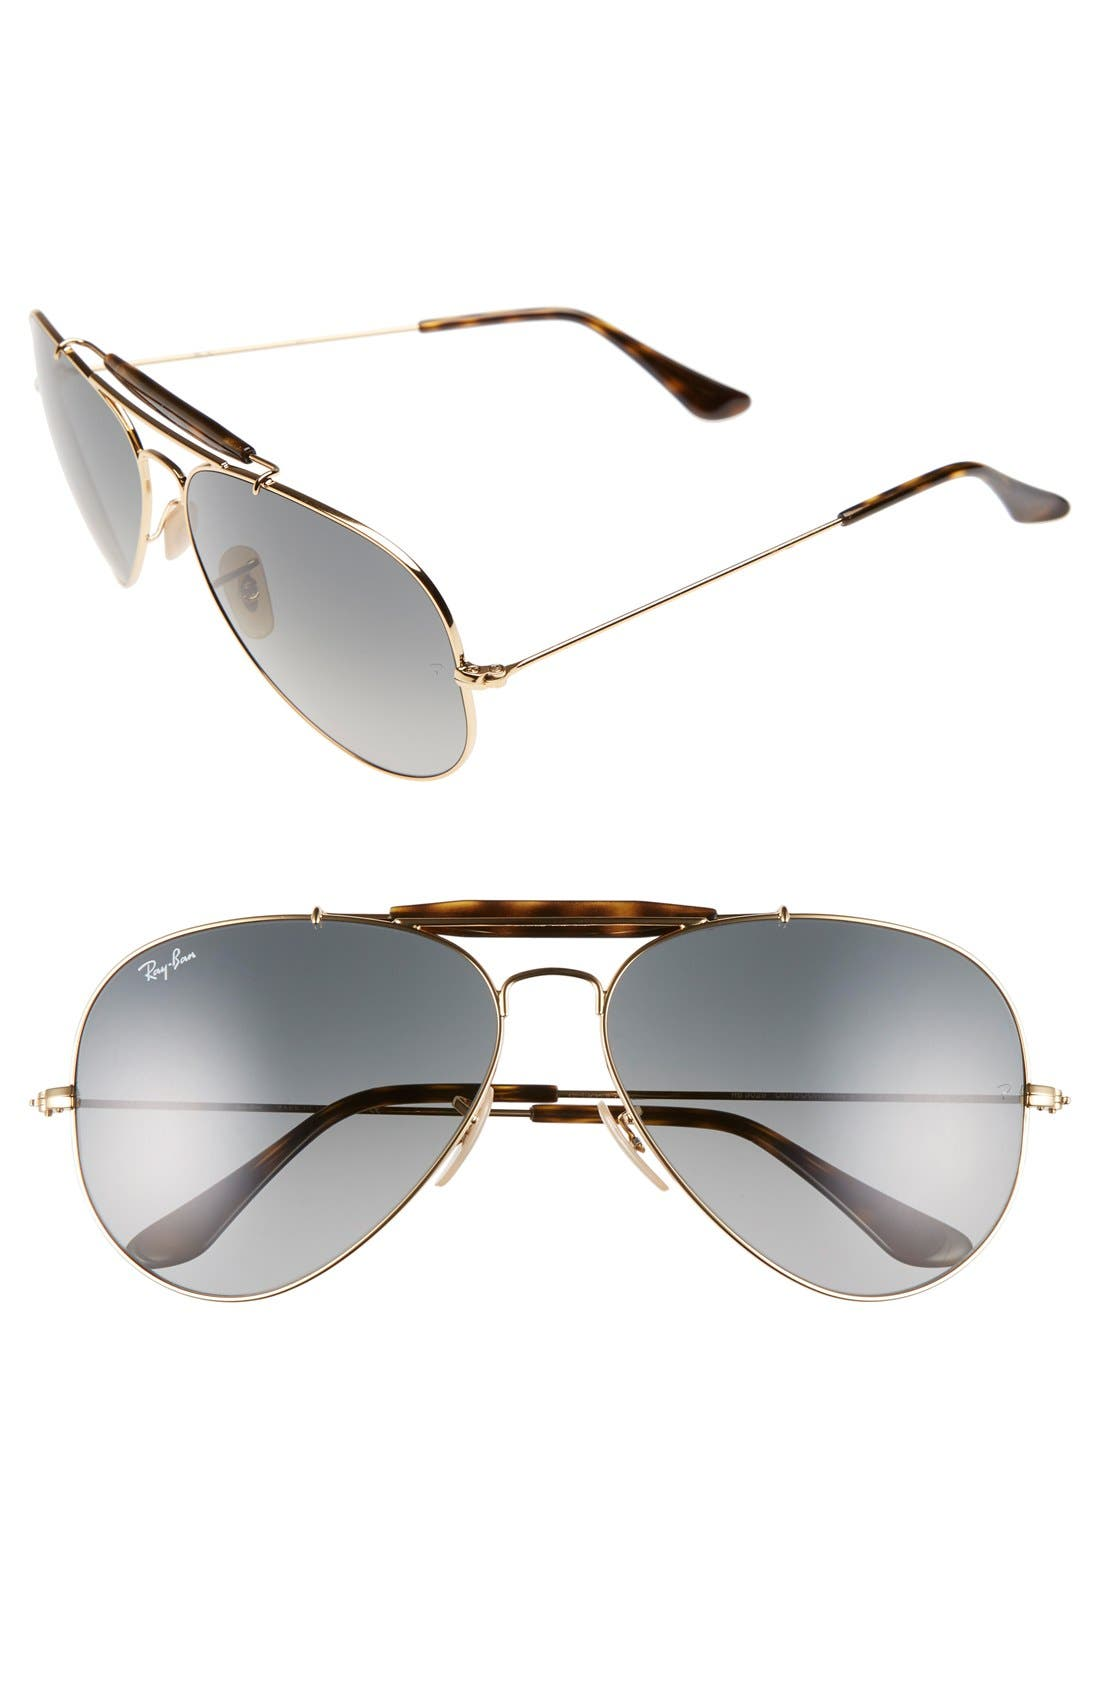 'Outdoorsman II' 62mm Sunglasses,                             Main thumbnail 1, color,                             GOLD/ GREY GRADIENT